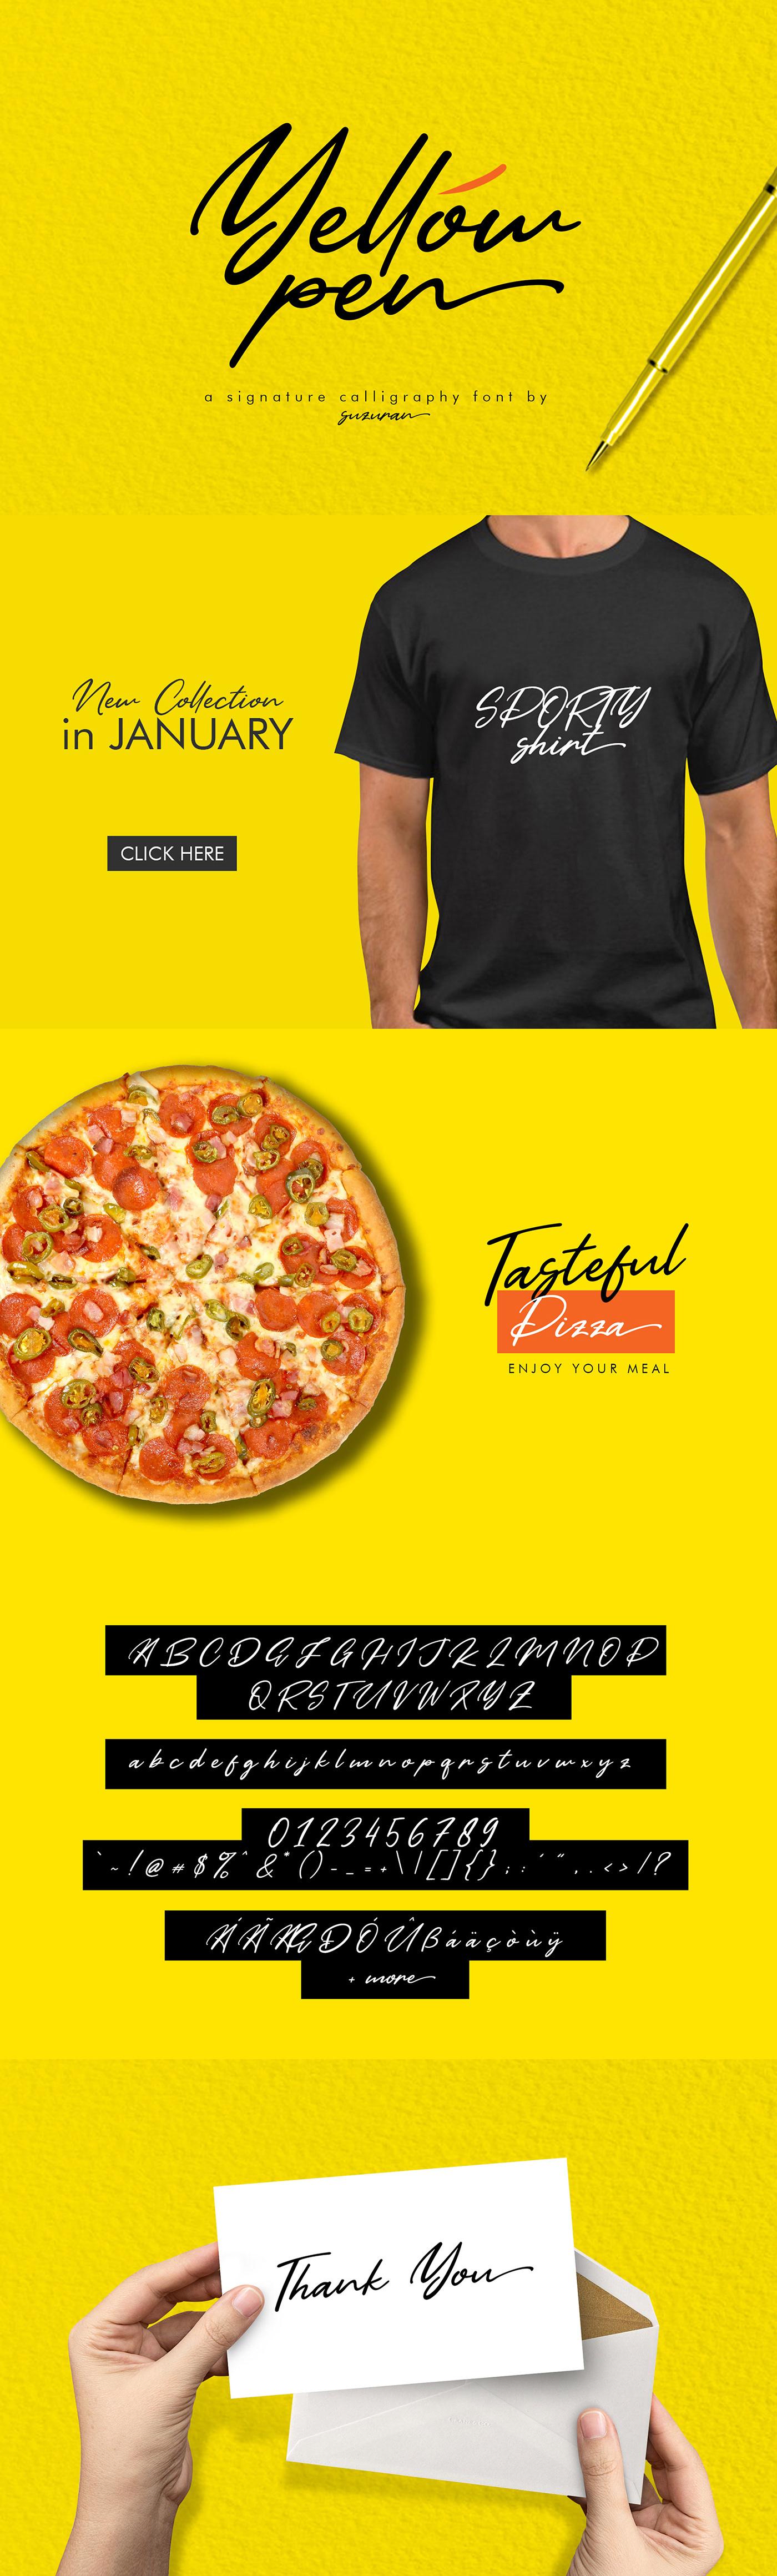 beauty font brand font branding  brush Classic classy Clothing creative Fashion font